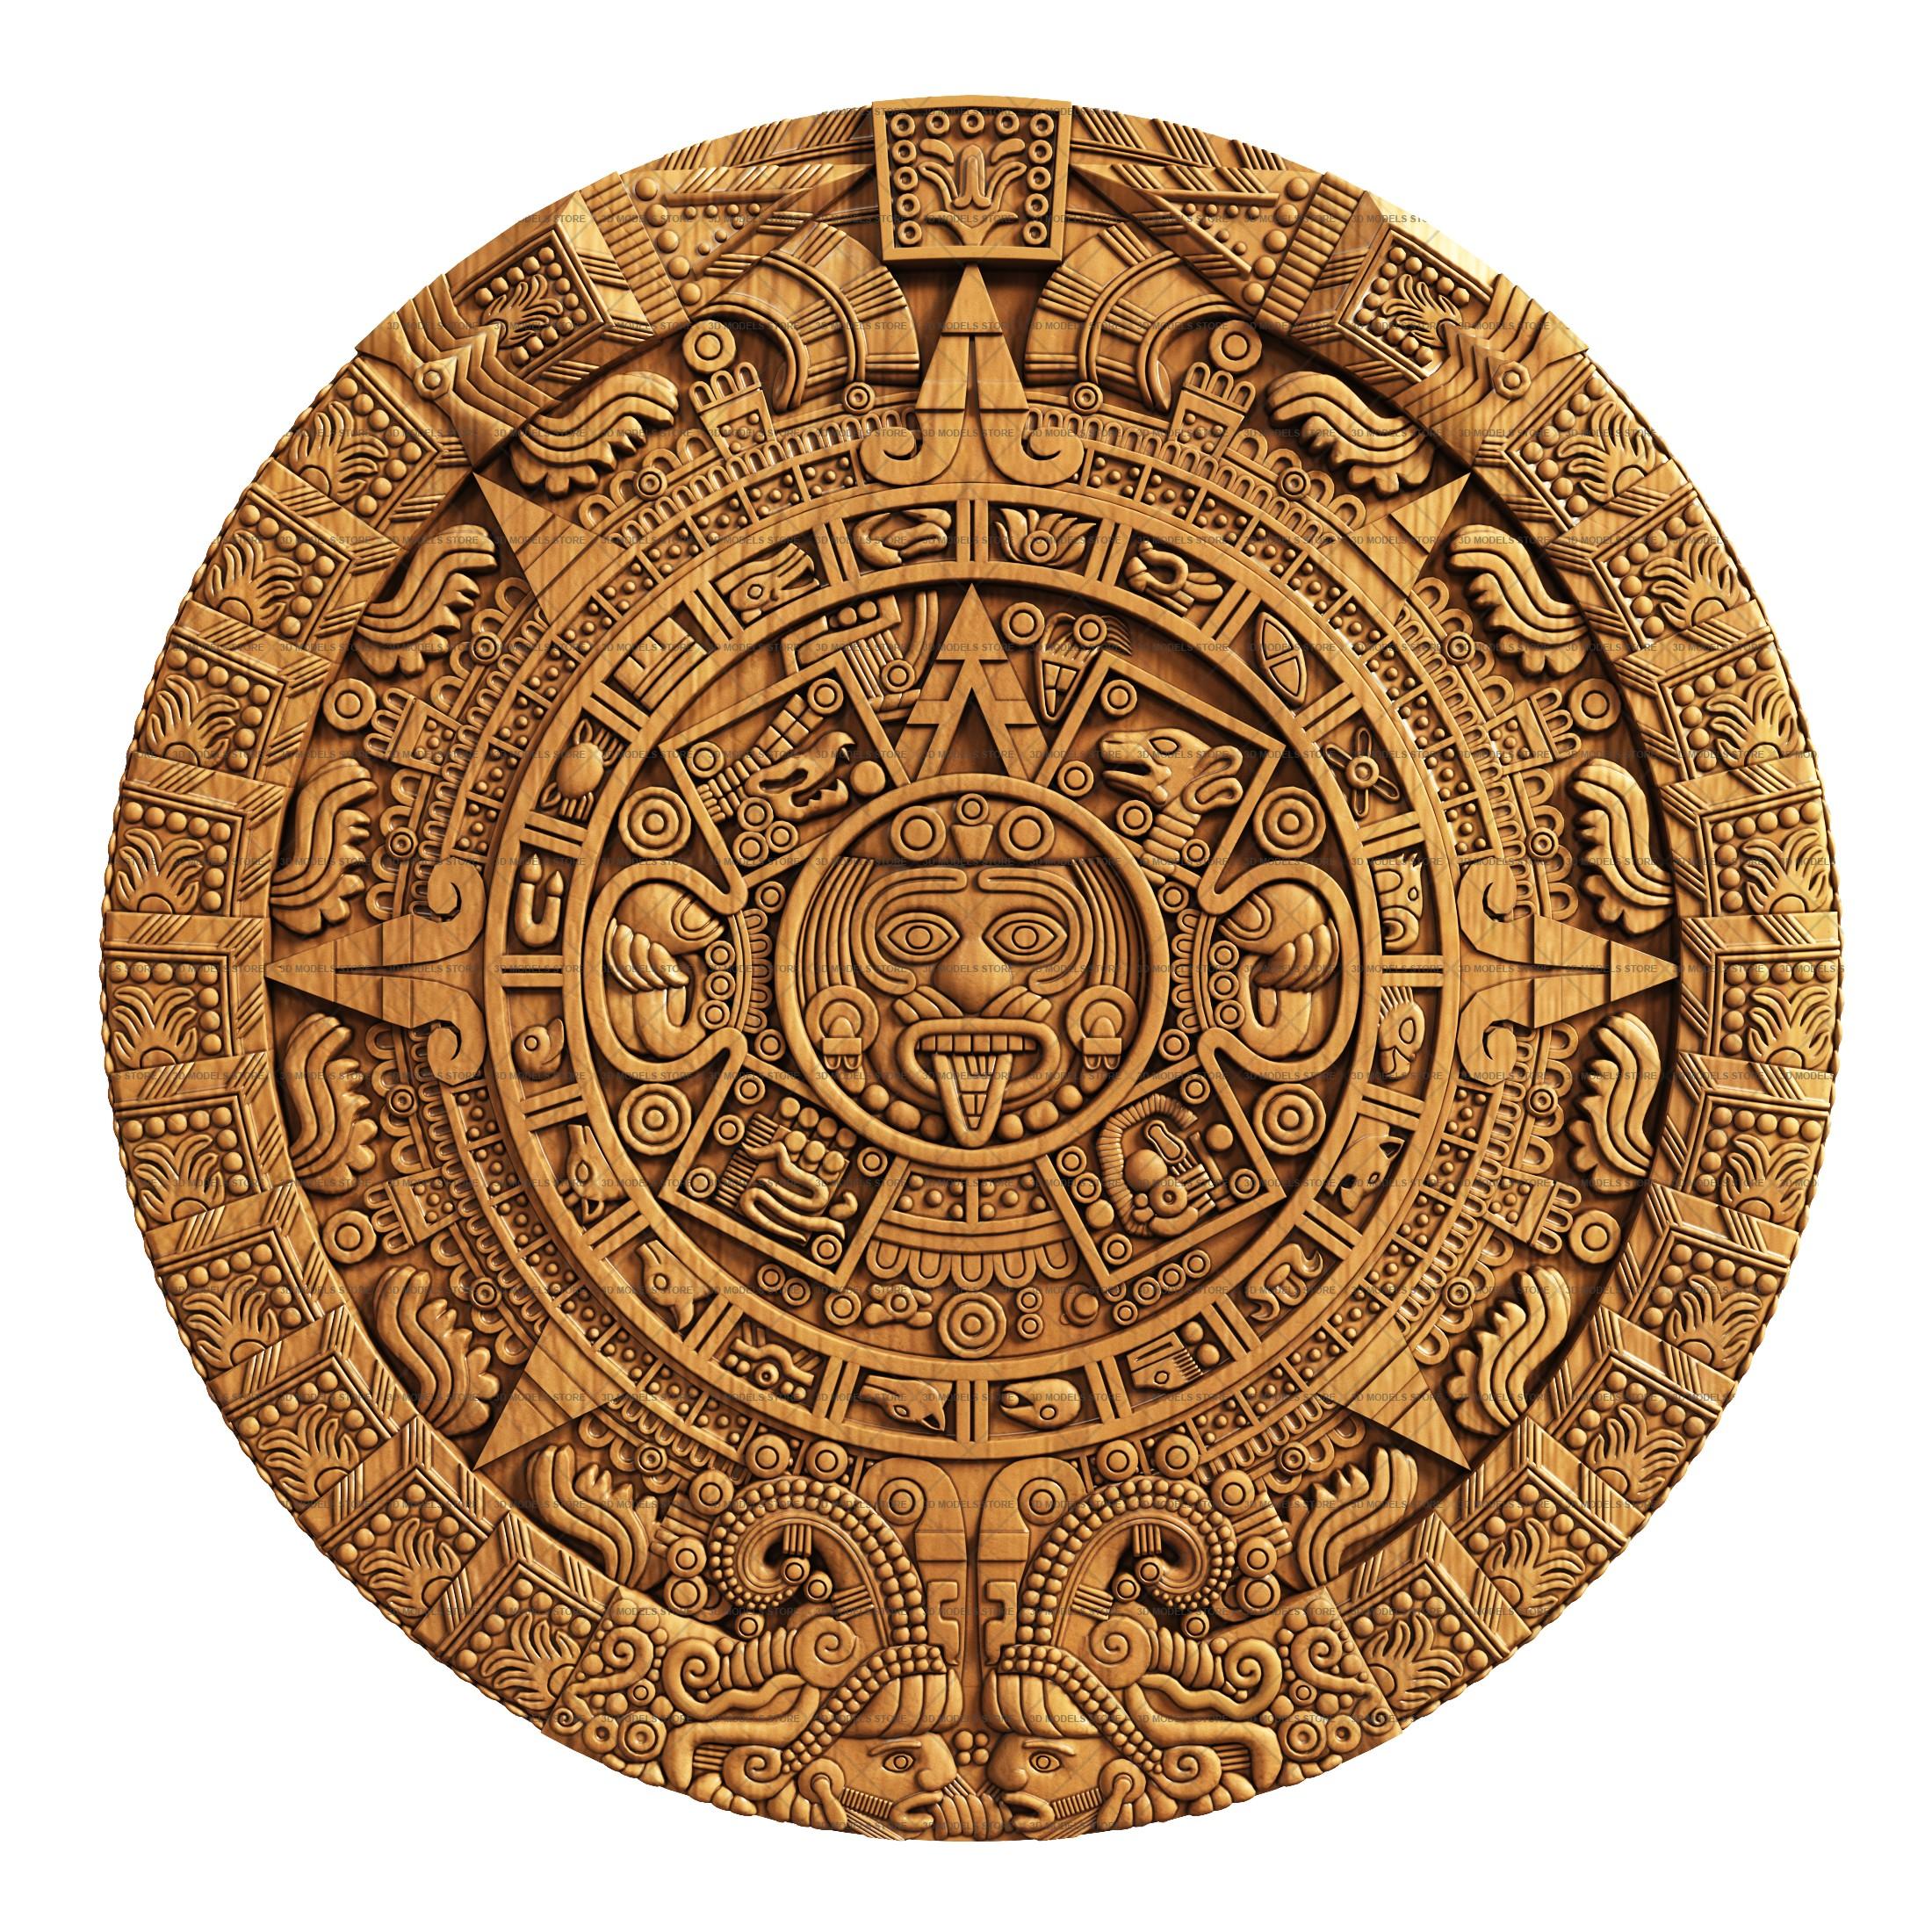 Календарь майя в картинке